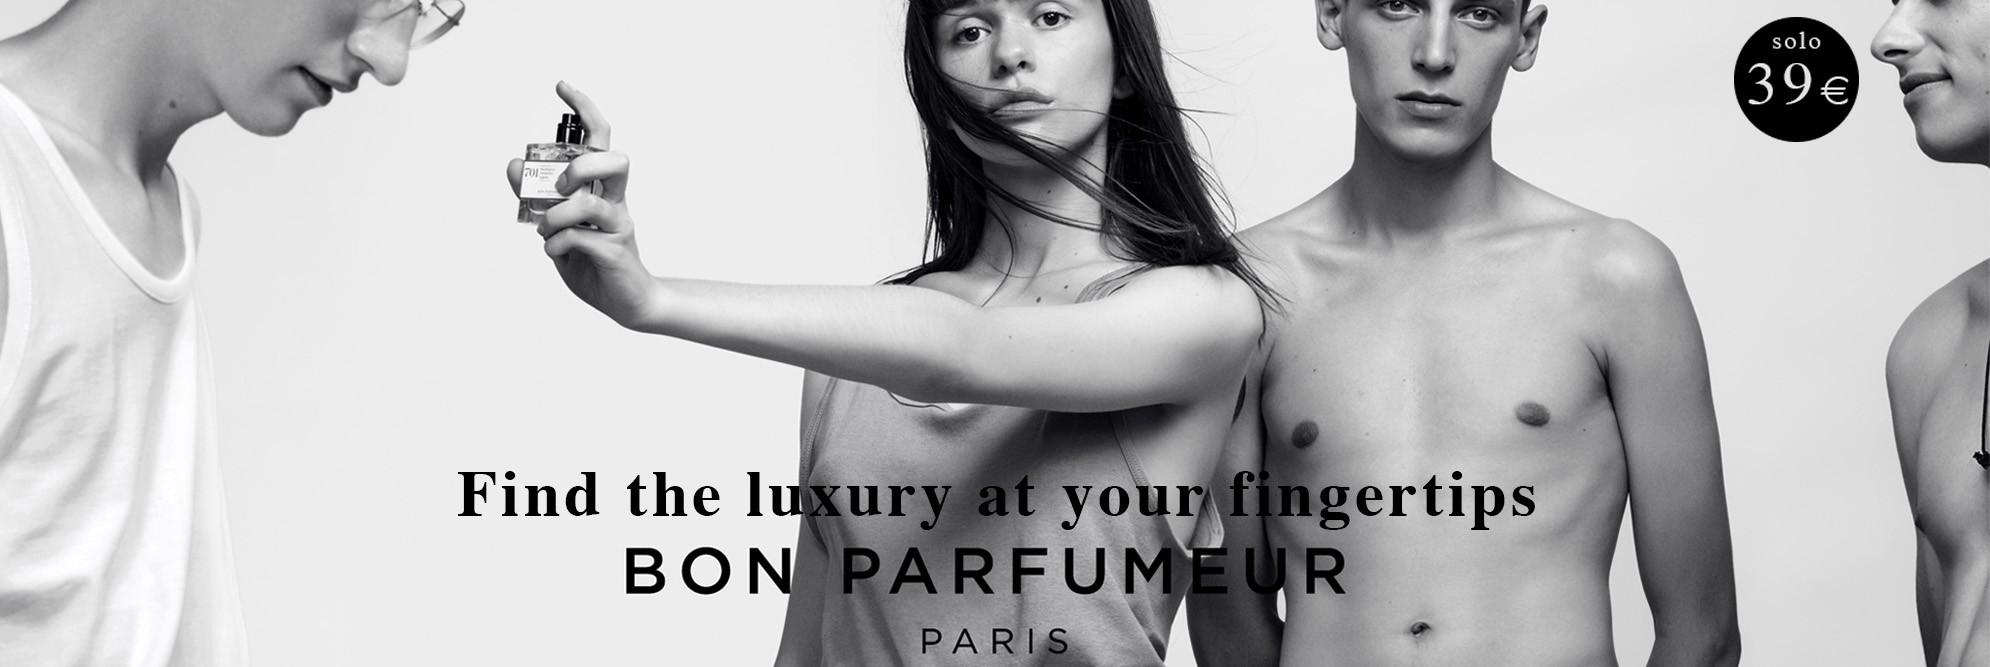 warm parfume fresh perfume luxury perfume